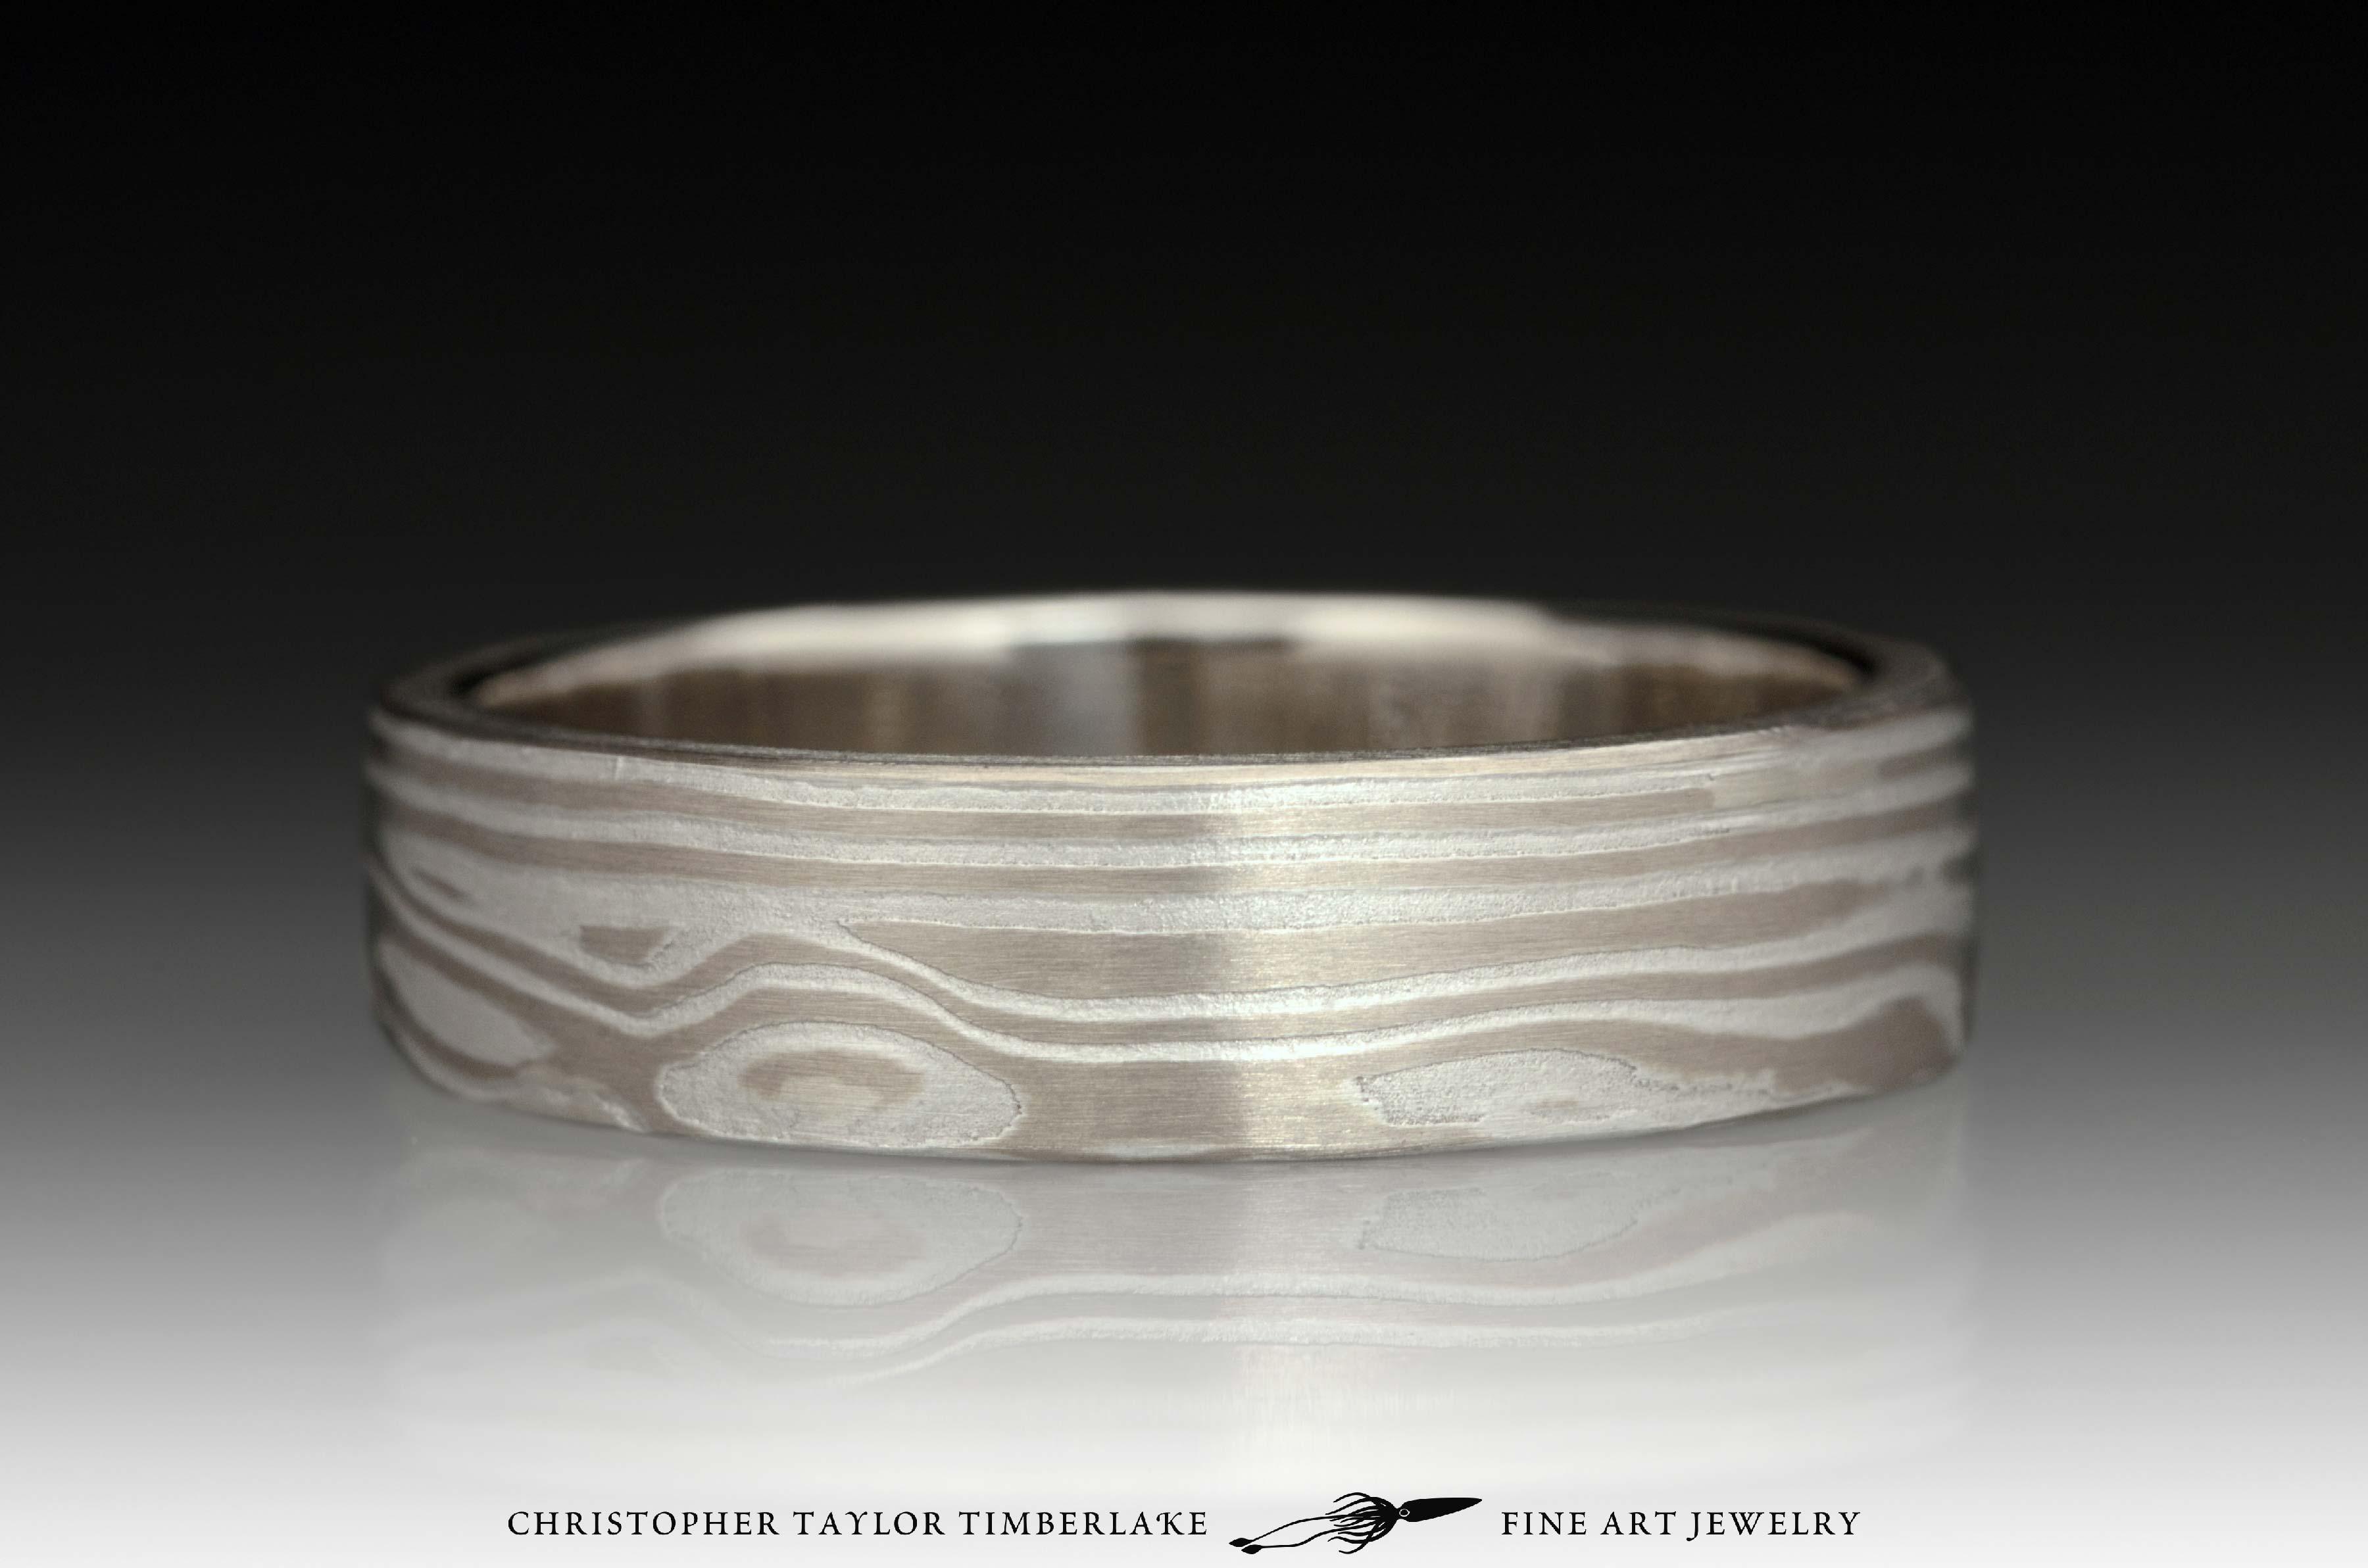 Mokumé-Mokume-Gane-Ring-(M92)-14K-karat-palladium-white-gold,-sterling-silver,-14k-white-gold-inner-band,-etched,-flat-topped,-wood-grain-4